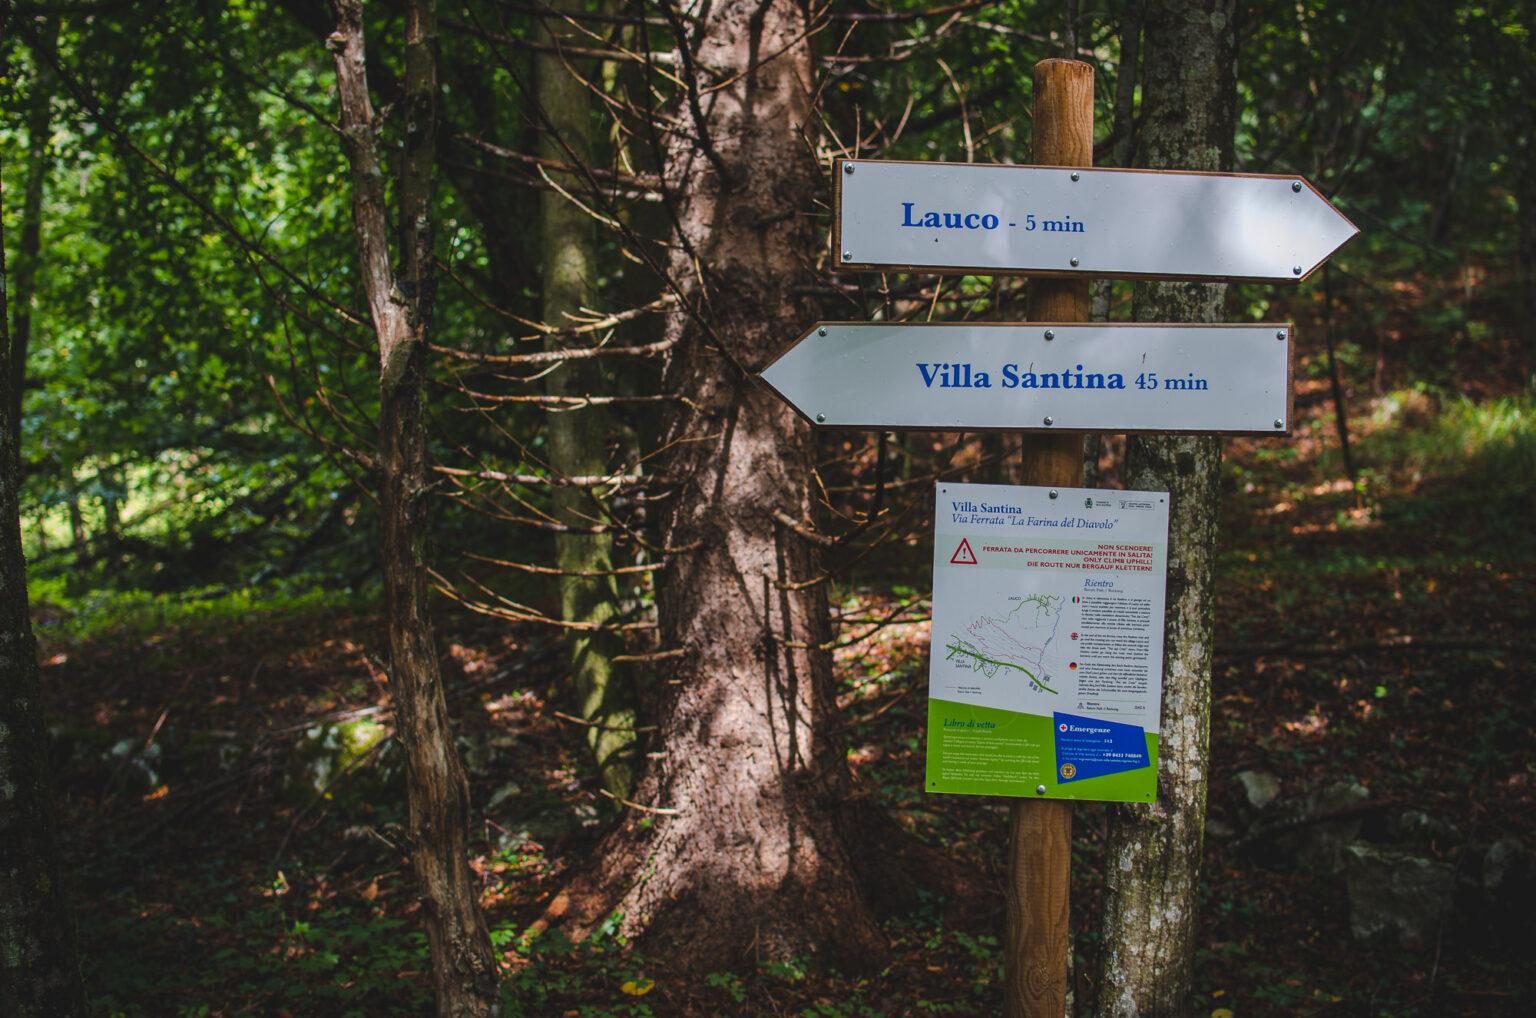 Szlakowskazy do Lauco i Villa Santina